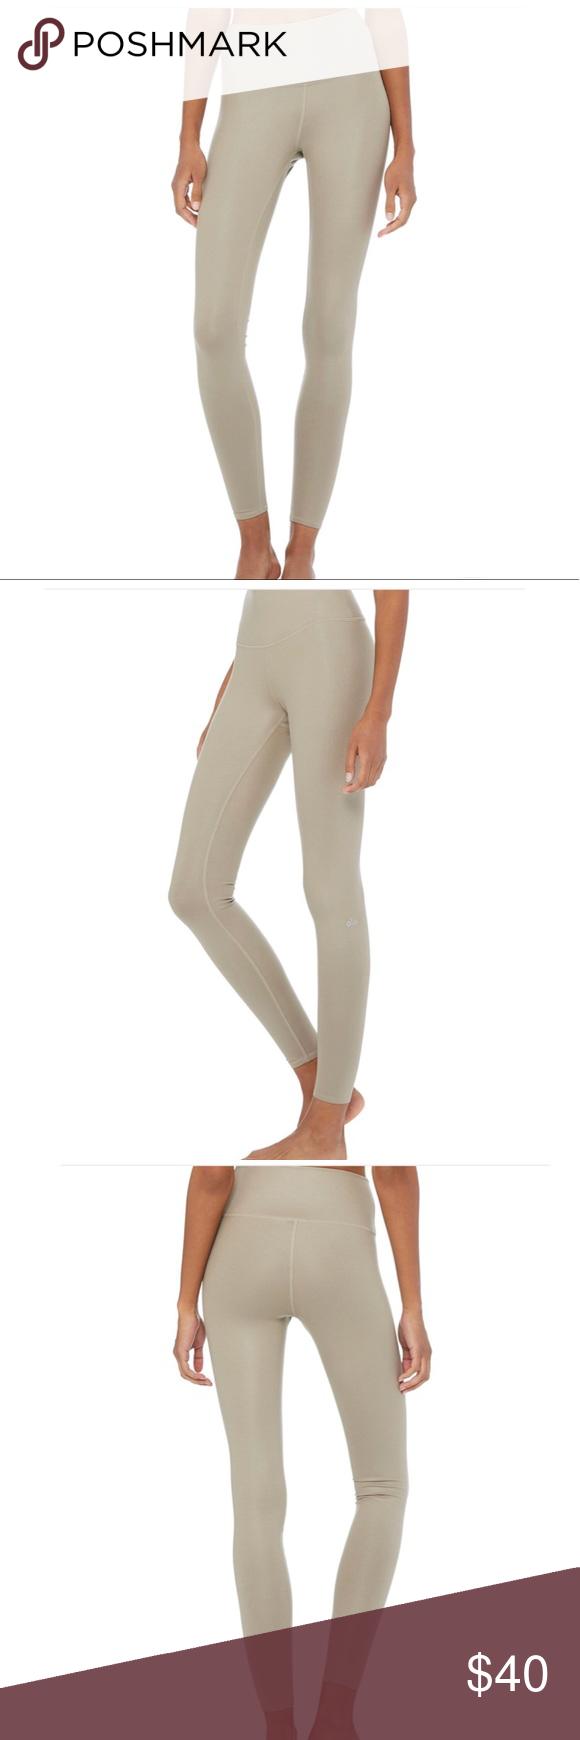 9805d7fabe4f7 Alo Yoga High Waist Airbrush Legging Alo Yoga high waist Airbrush Legging  in Glossy Gravel.